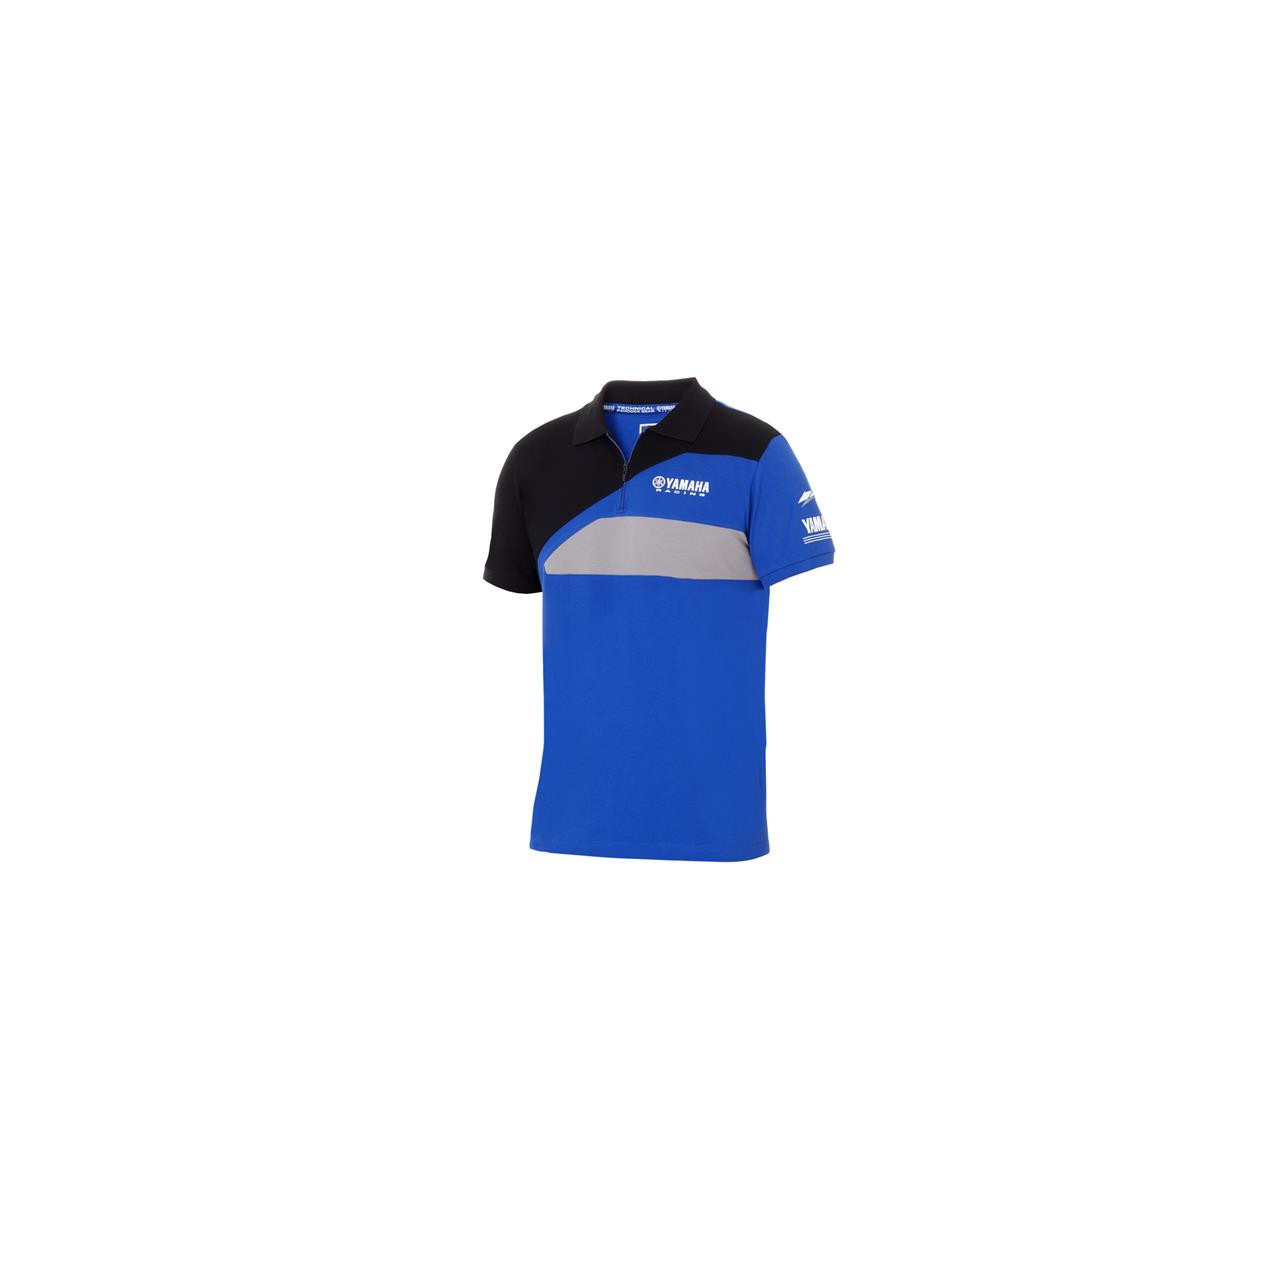 YAMAHA Polo sport homme Paddock Bleu 2018